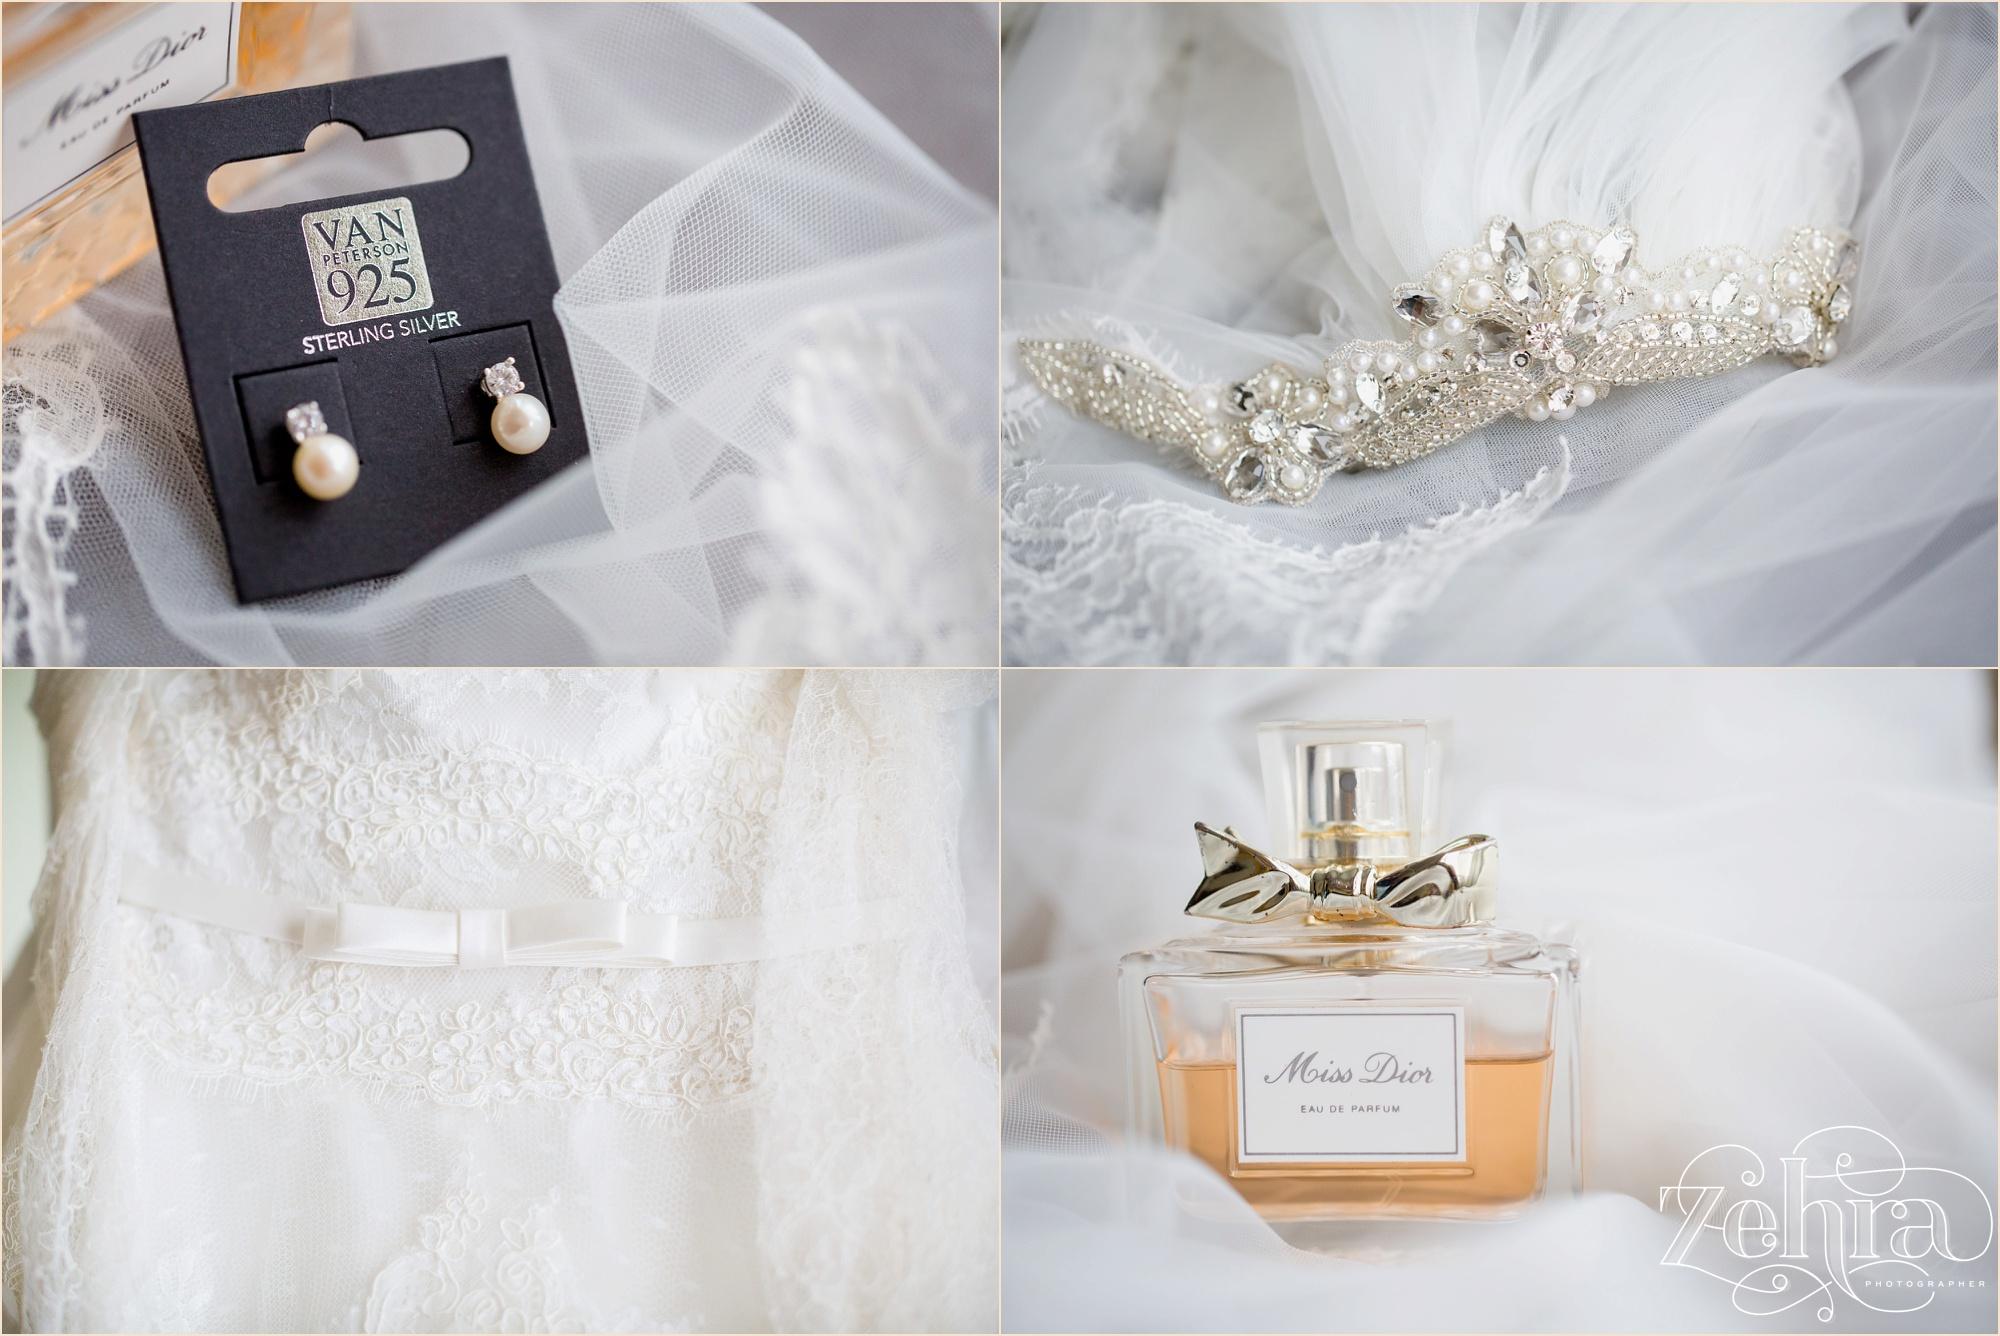 jasira manchester wedding photographer_0001.jpg